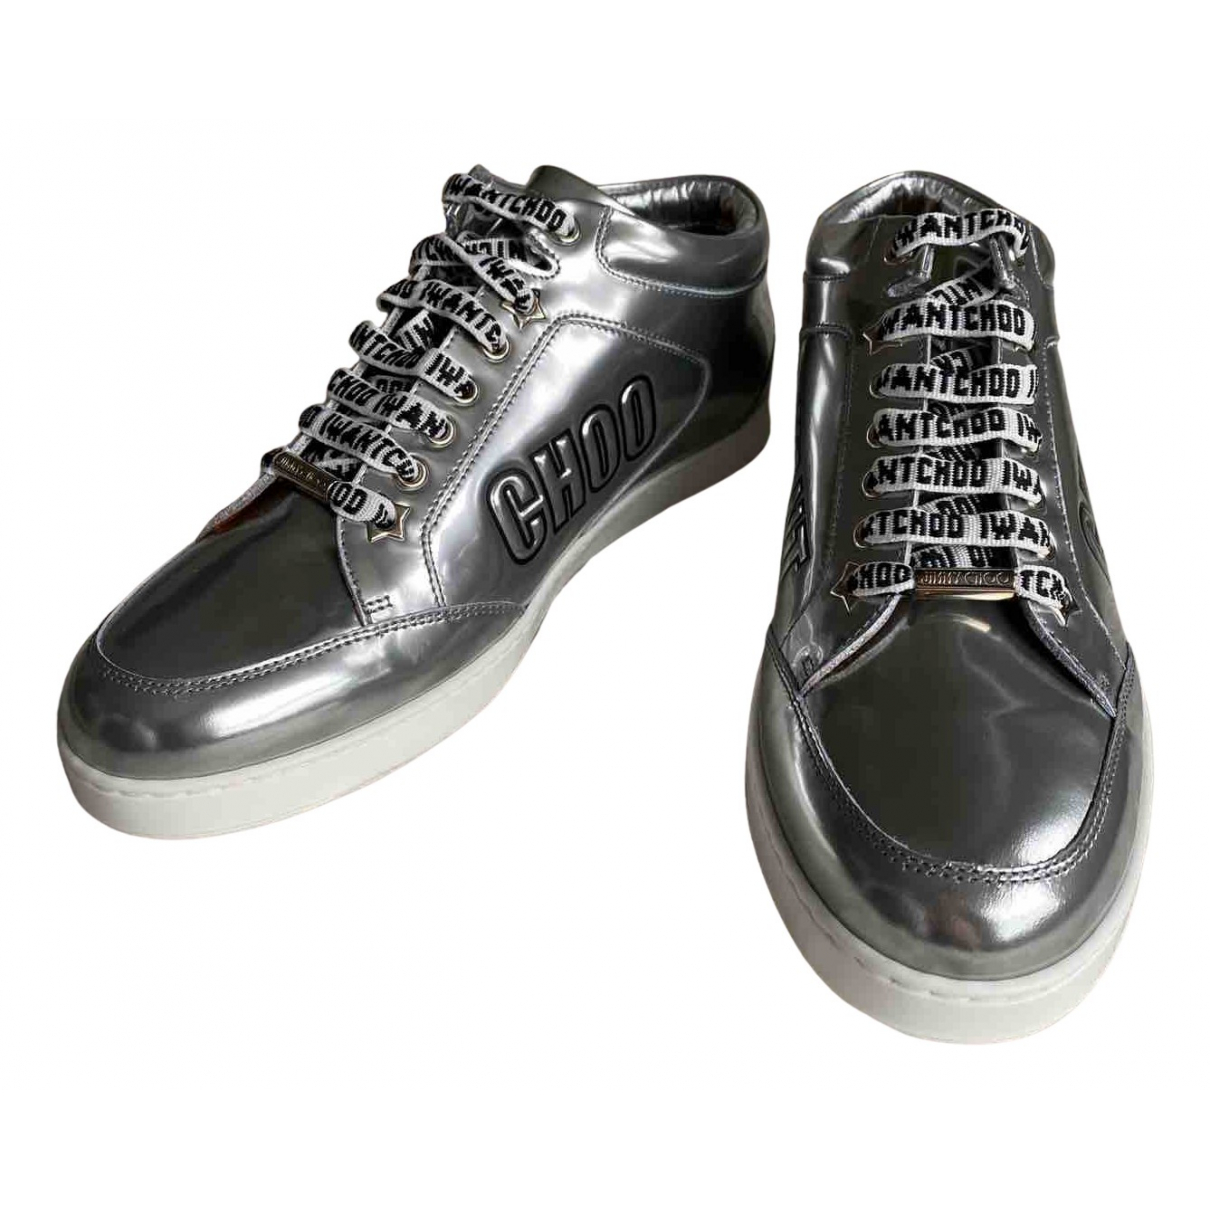 Jimmy Choo N Silver Leather Trainers for Women 40 EU